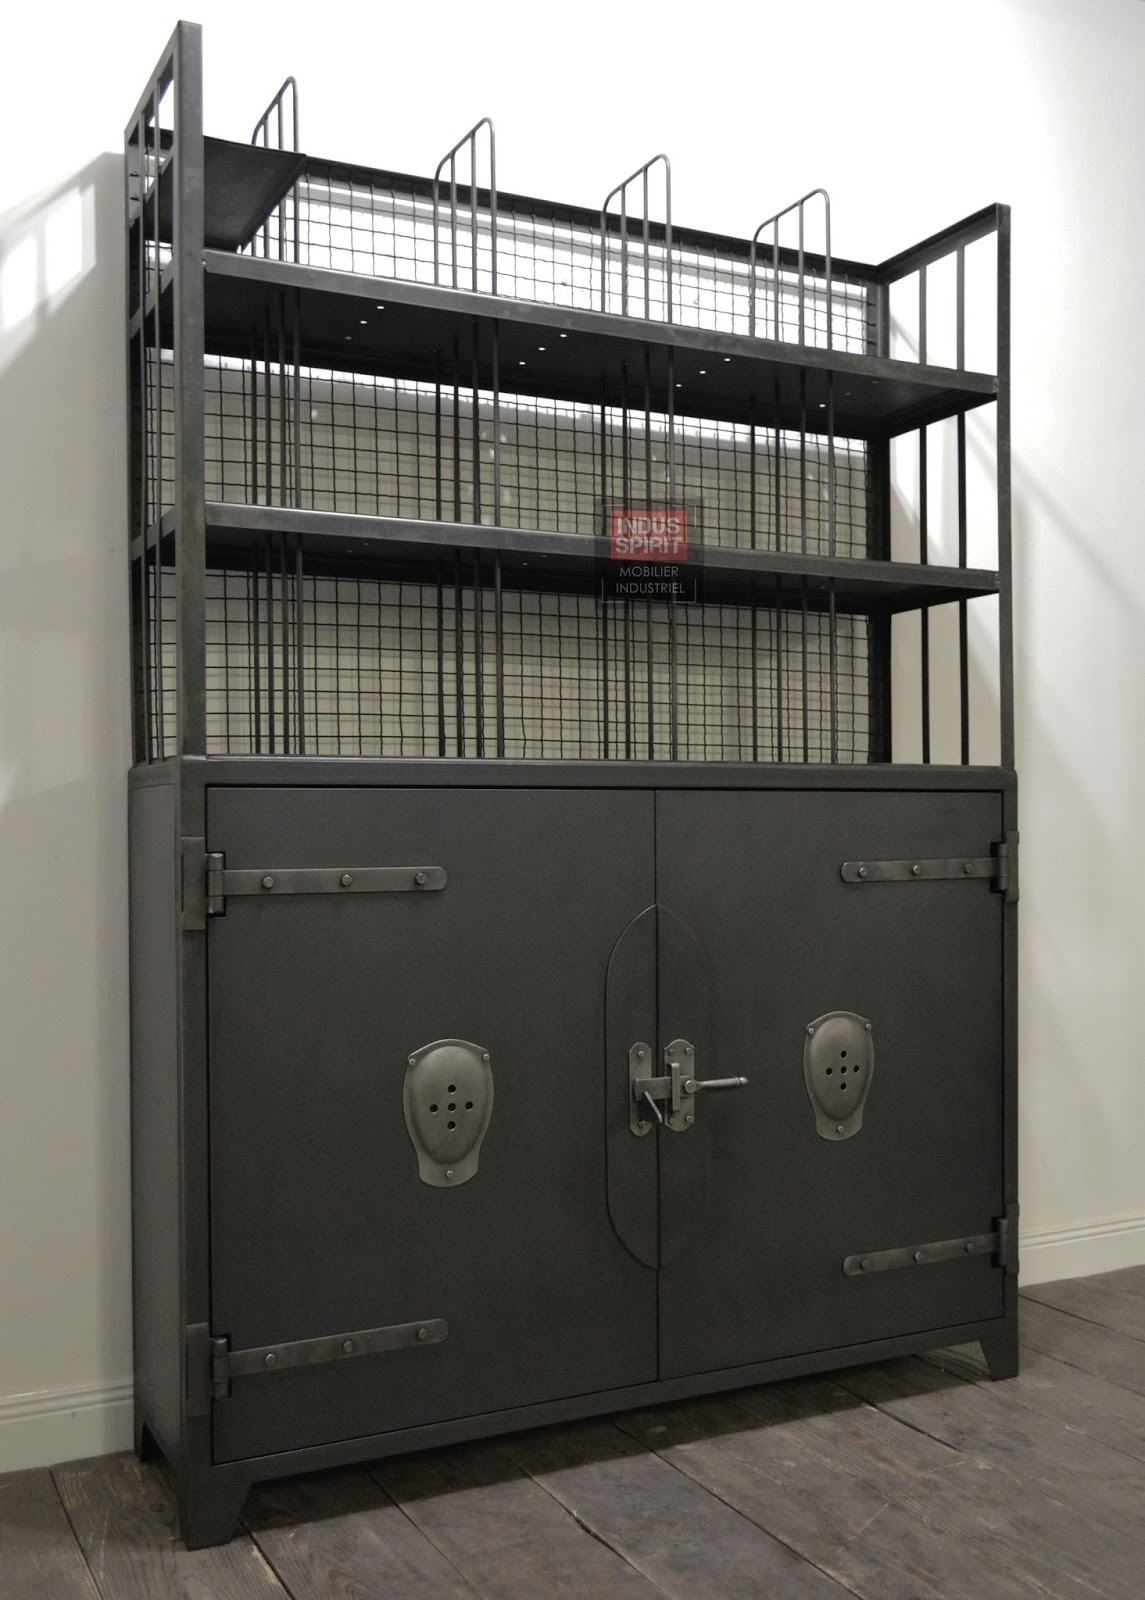 vaisselier industriel. Black Bedroom Furniture Sets. Home Design Ideas